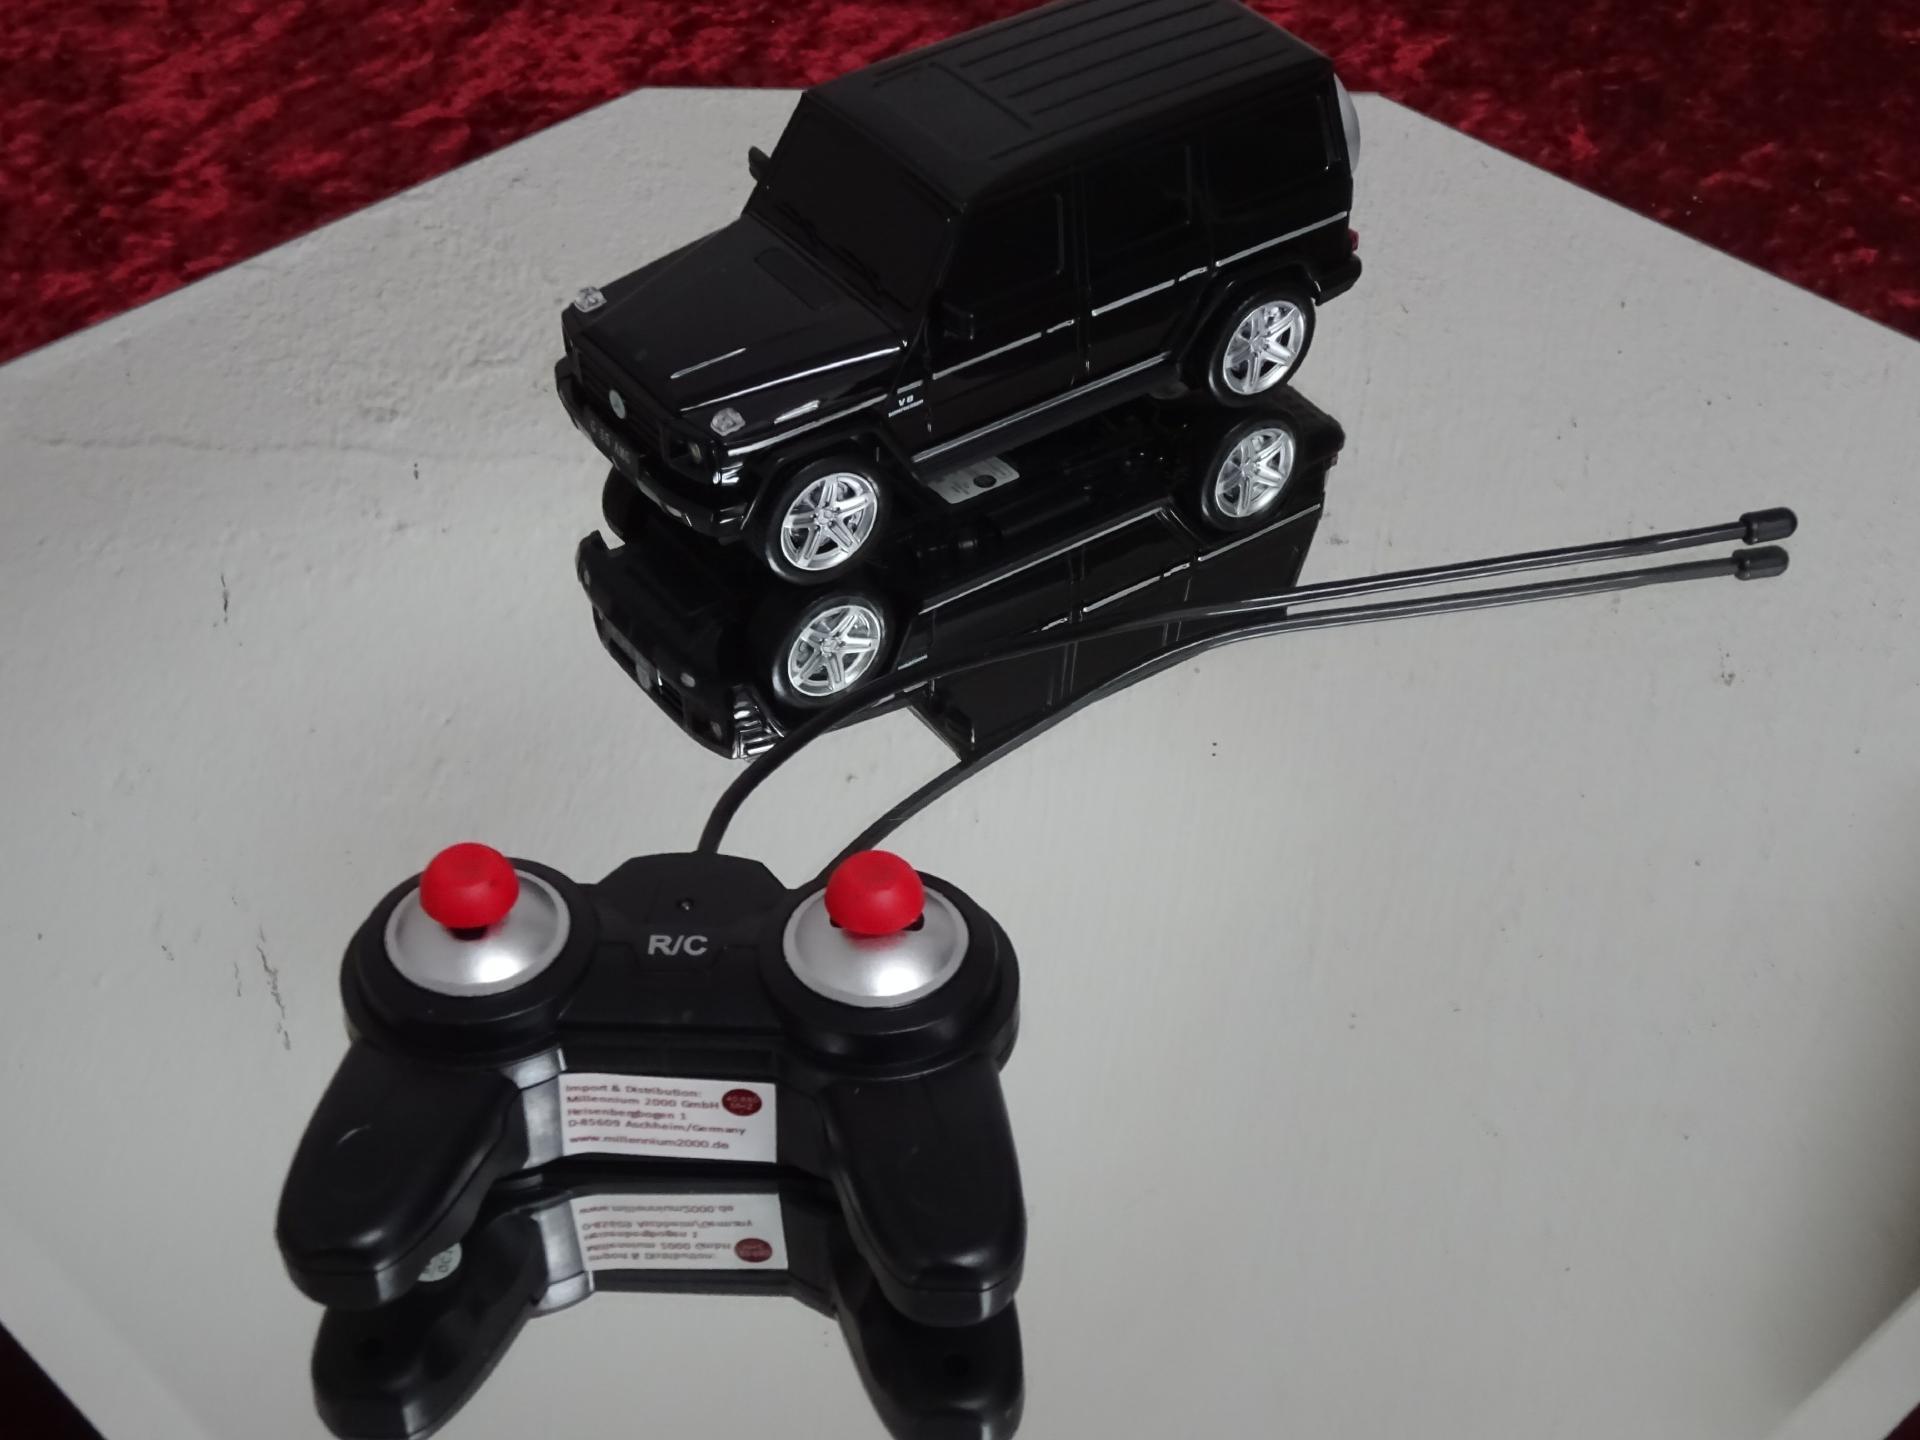 mercedes g modellauto ferngesteuert g55amg 3 g shop24. Black Bedroom Furniture Sets. Home Design Ideas